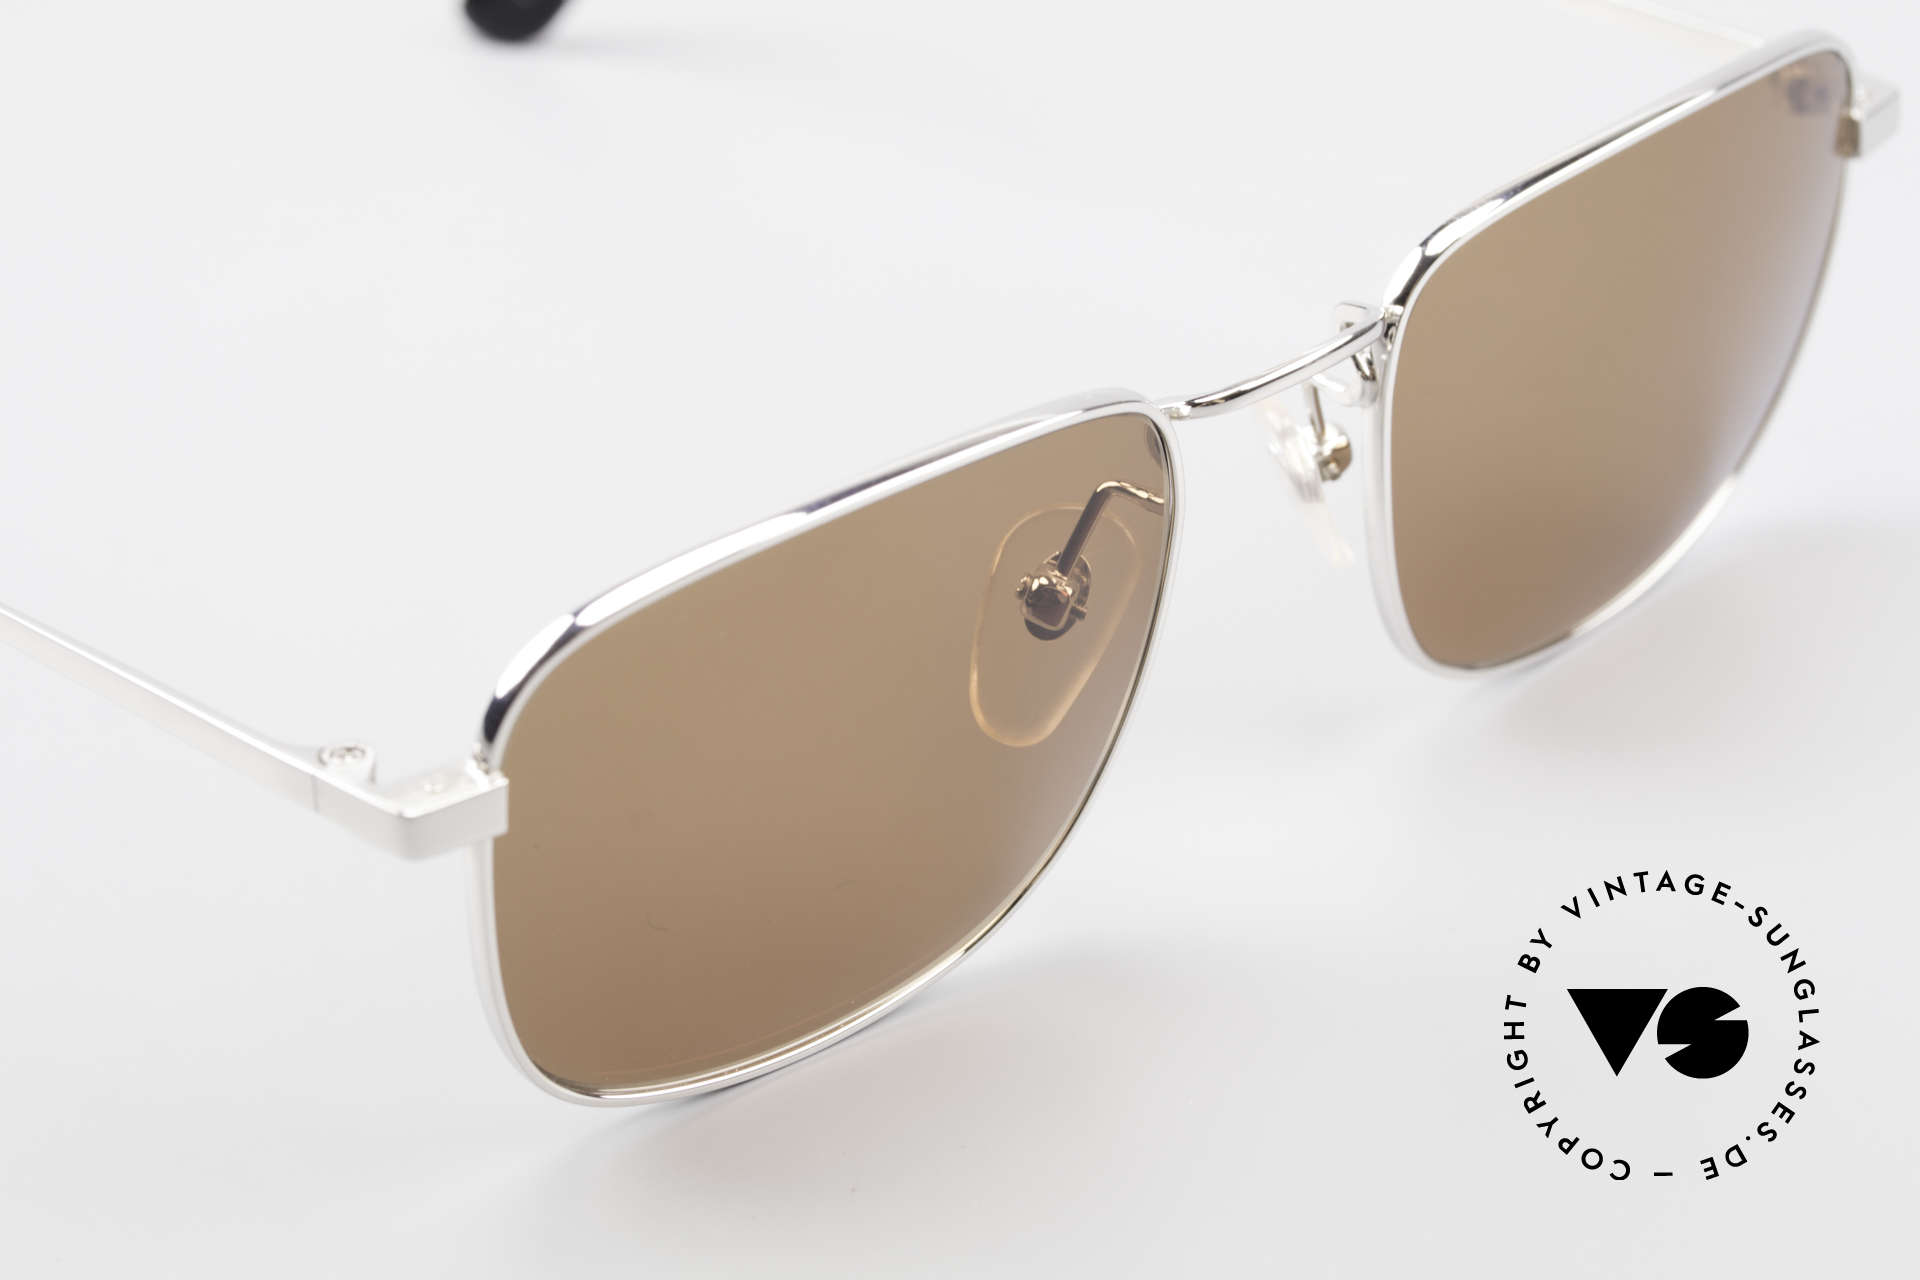 Helmut Lang 21-0004 Titanium Sunglasses Japan, never worn (like all our vintage HELMUT LANG shades), Made for Men